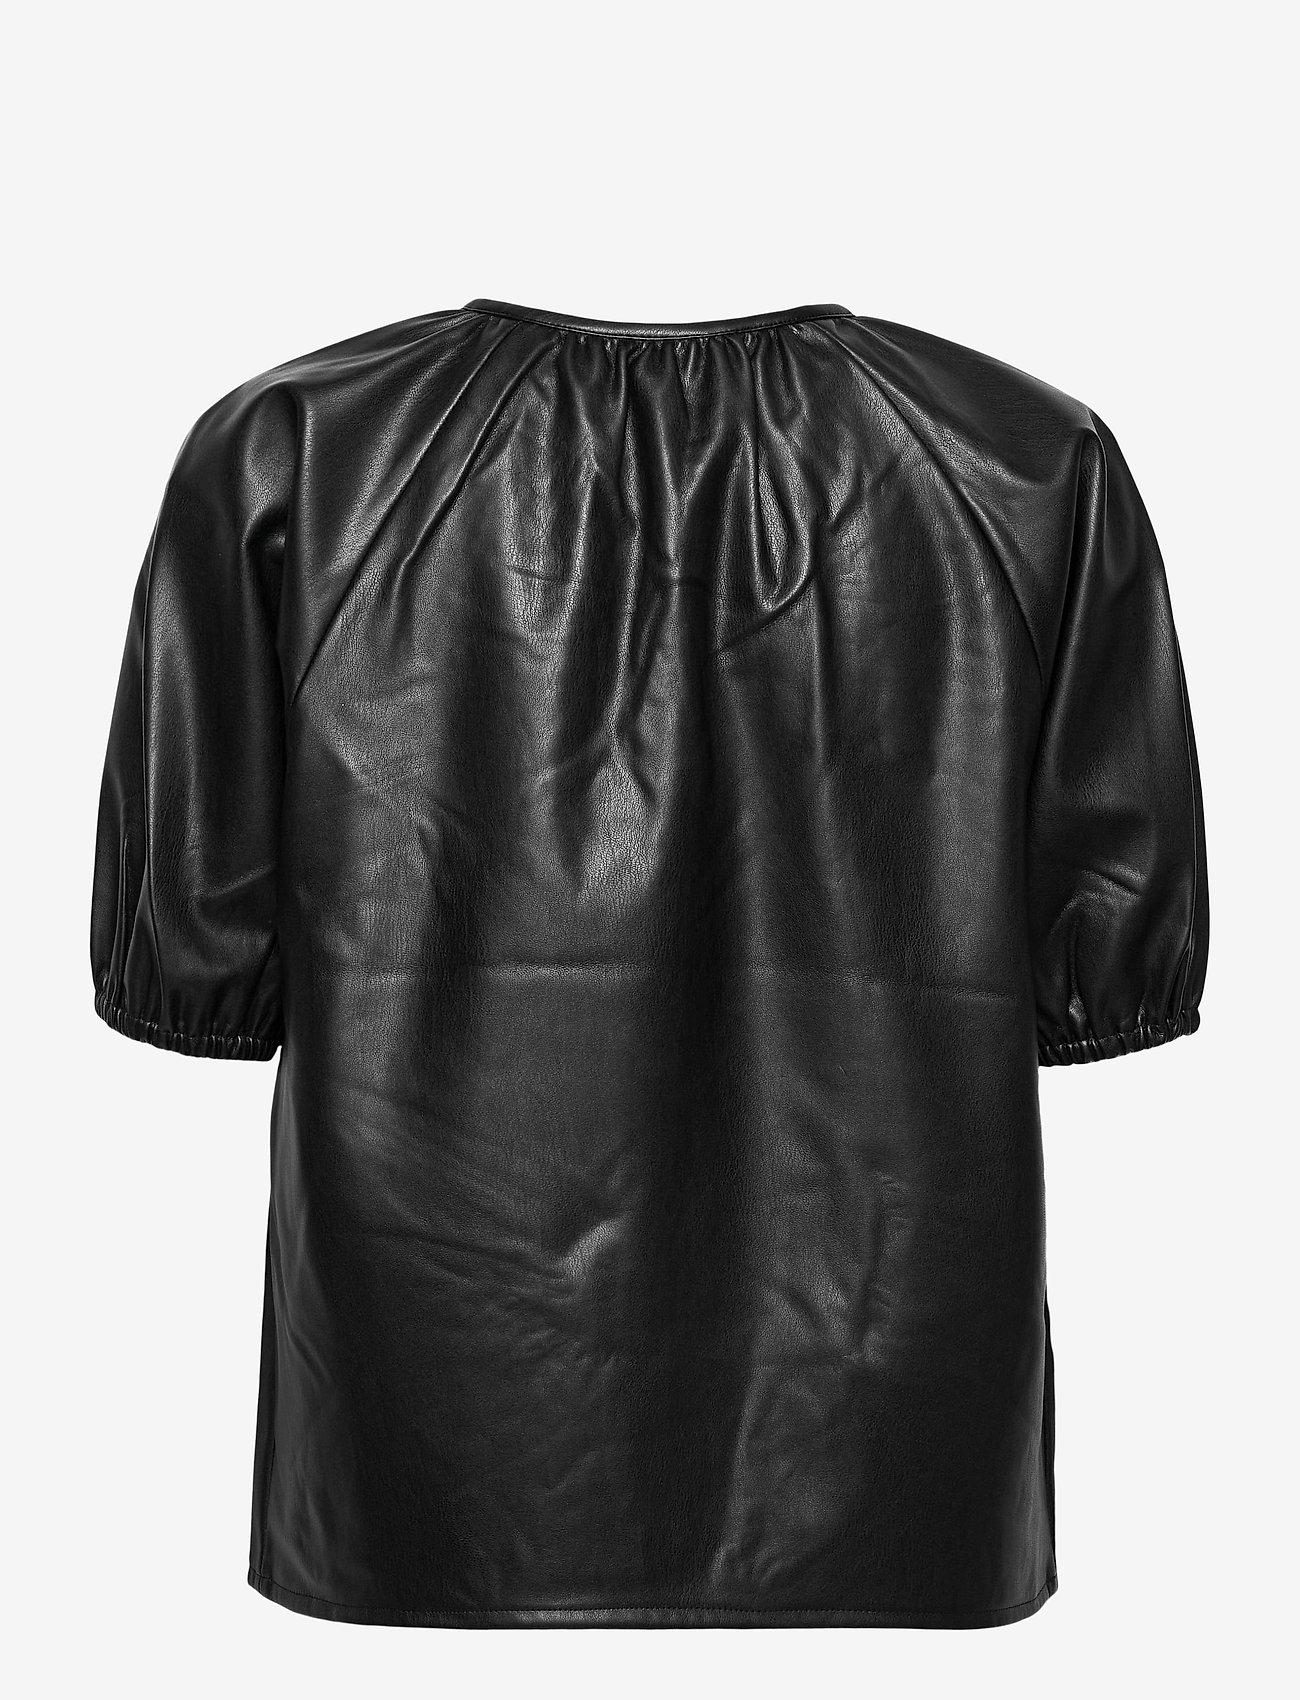 Vero Moda - VMSOLAGLORIA S/S COATED TOP - kortärmade blusar - black - 1